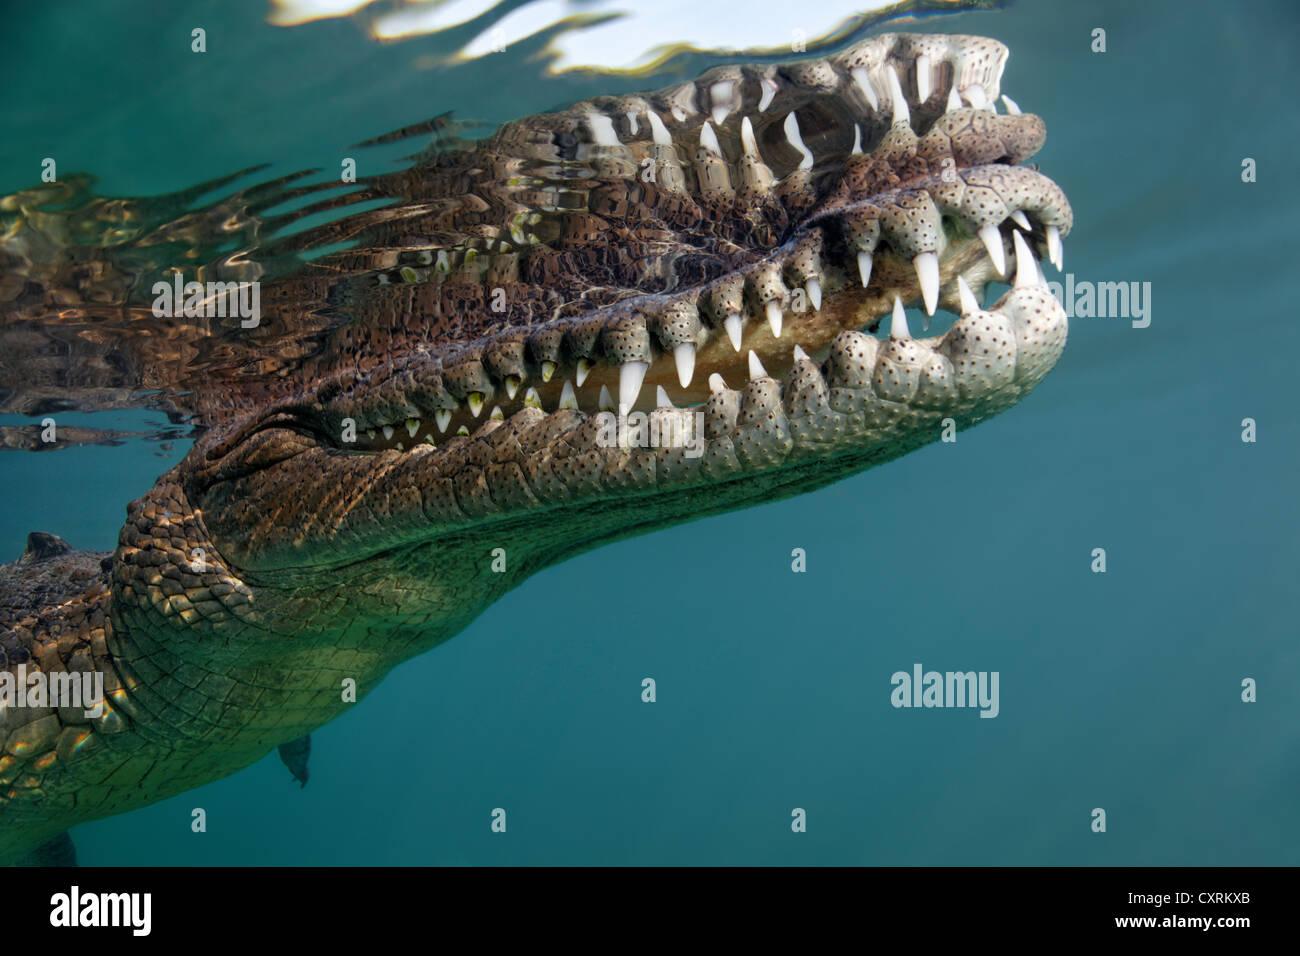 Saltwater Crocodile or Estuarine Crocodile or Indo-Pacific Crocodile (Crocodylus porosus), head, mouth, set of teeth, - Stock Image